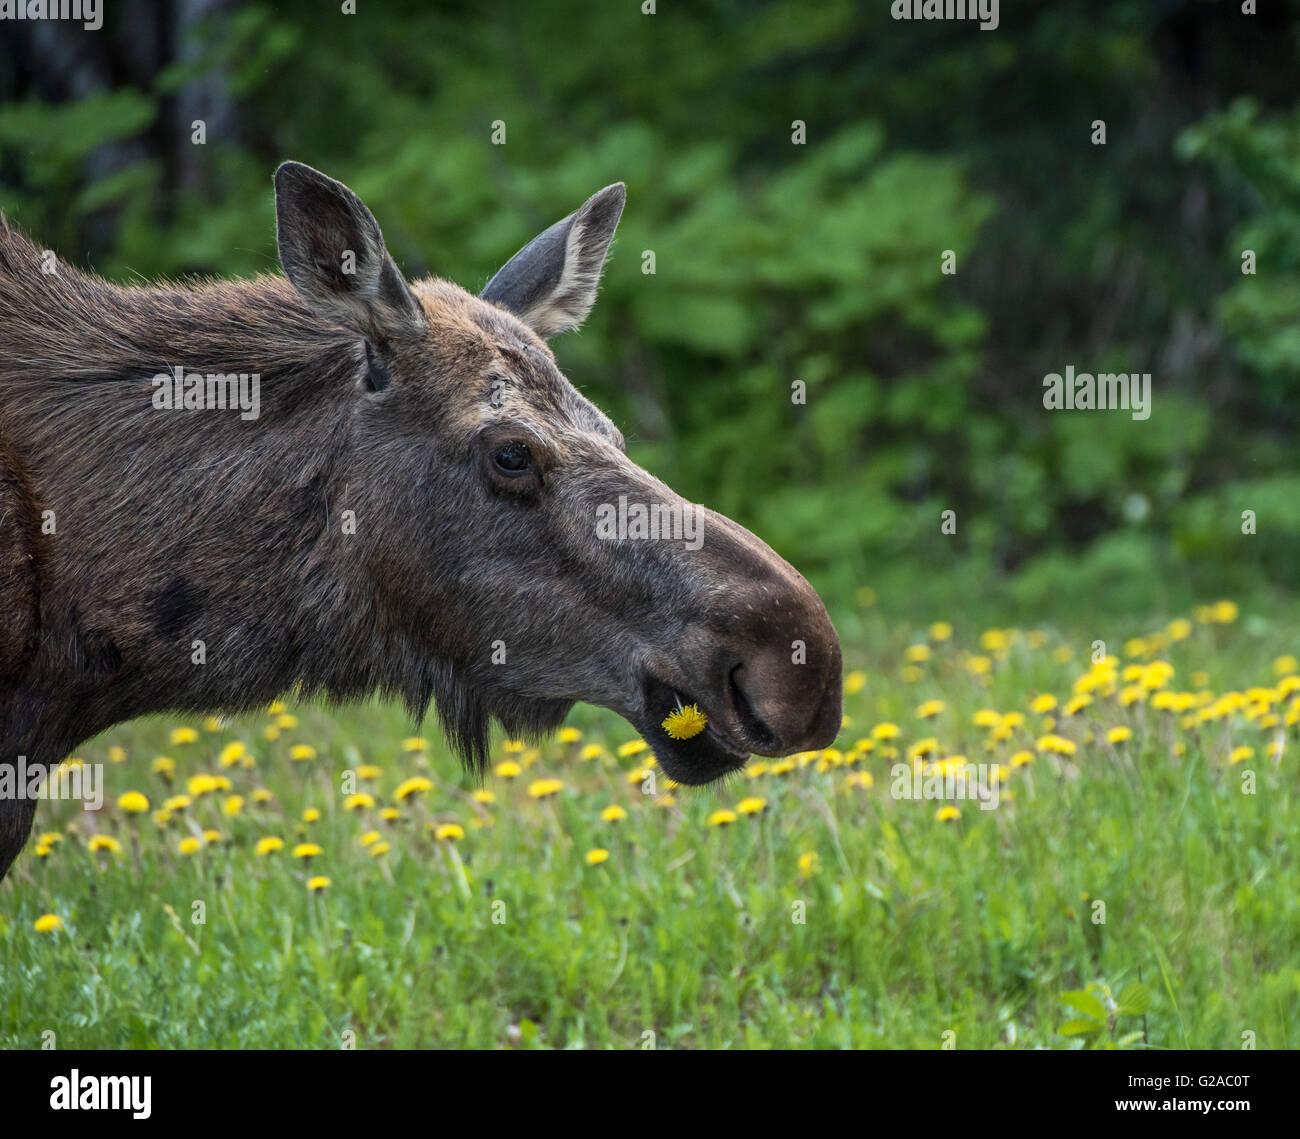 Cow Moose eating Dandelions - Stock Image